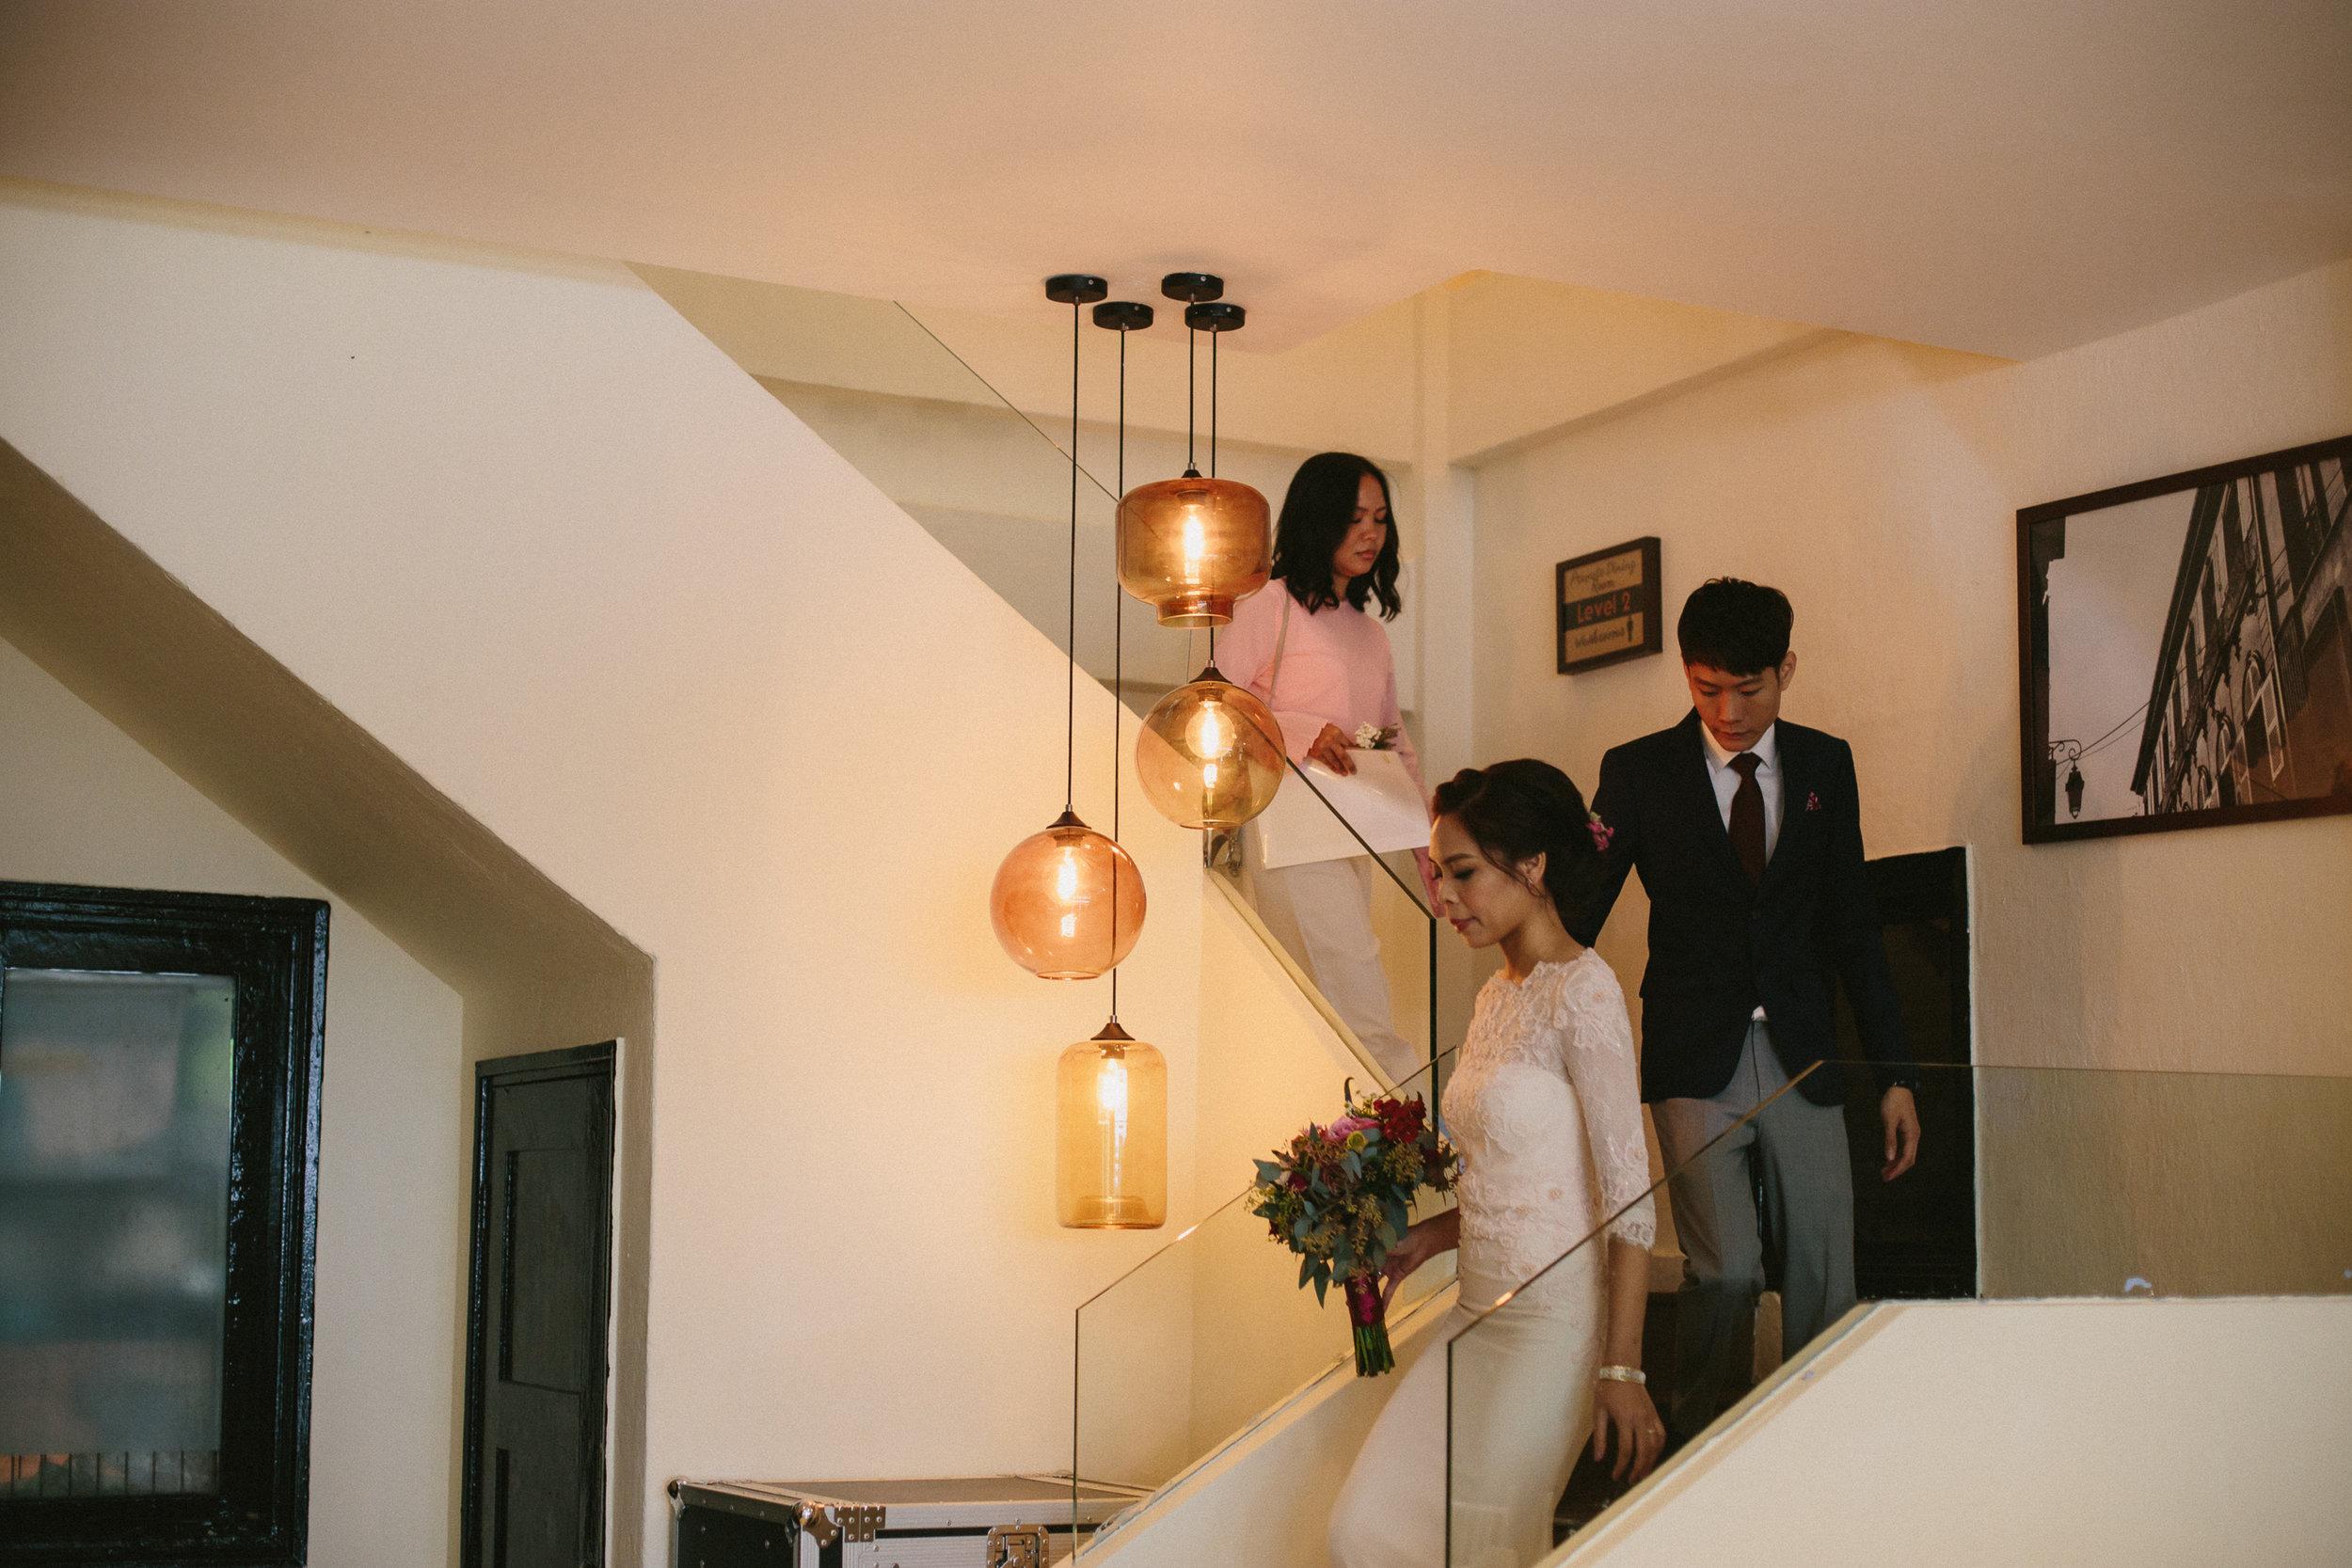 singapore-wedding-photographer-fadilah-kwan-006.jpg